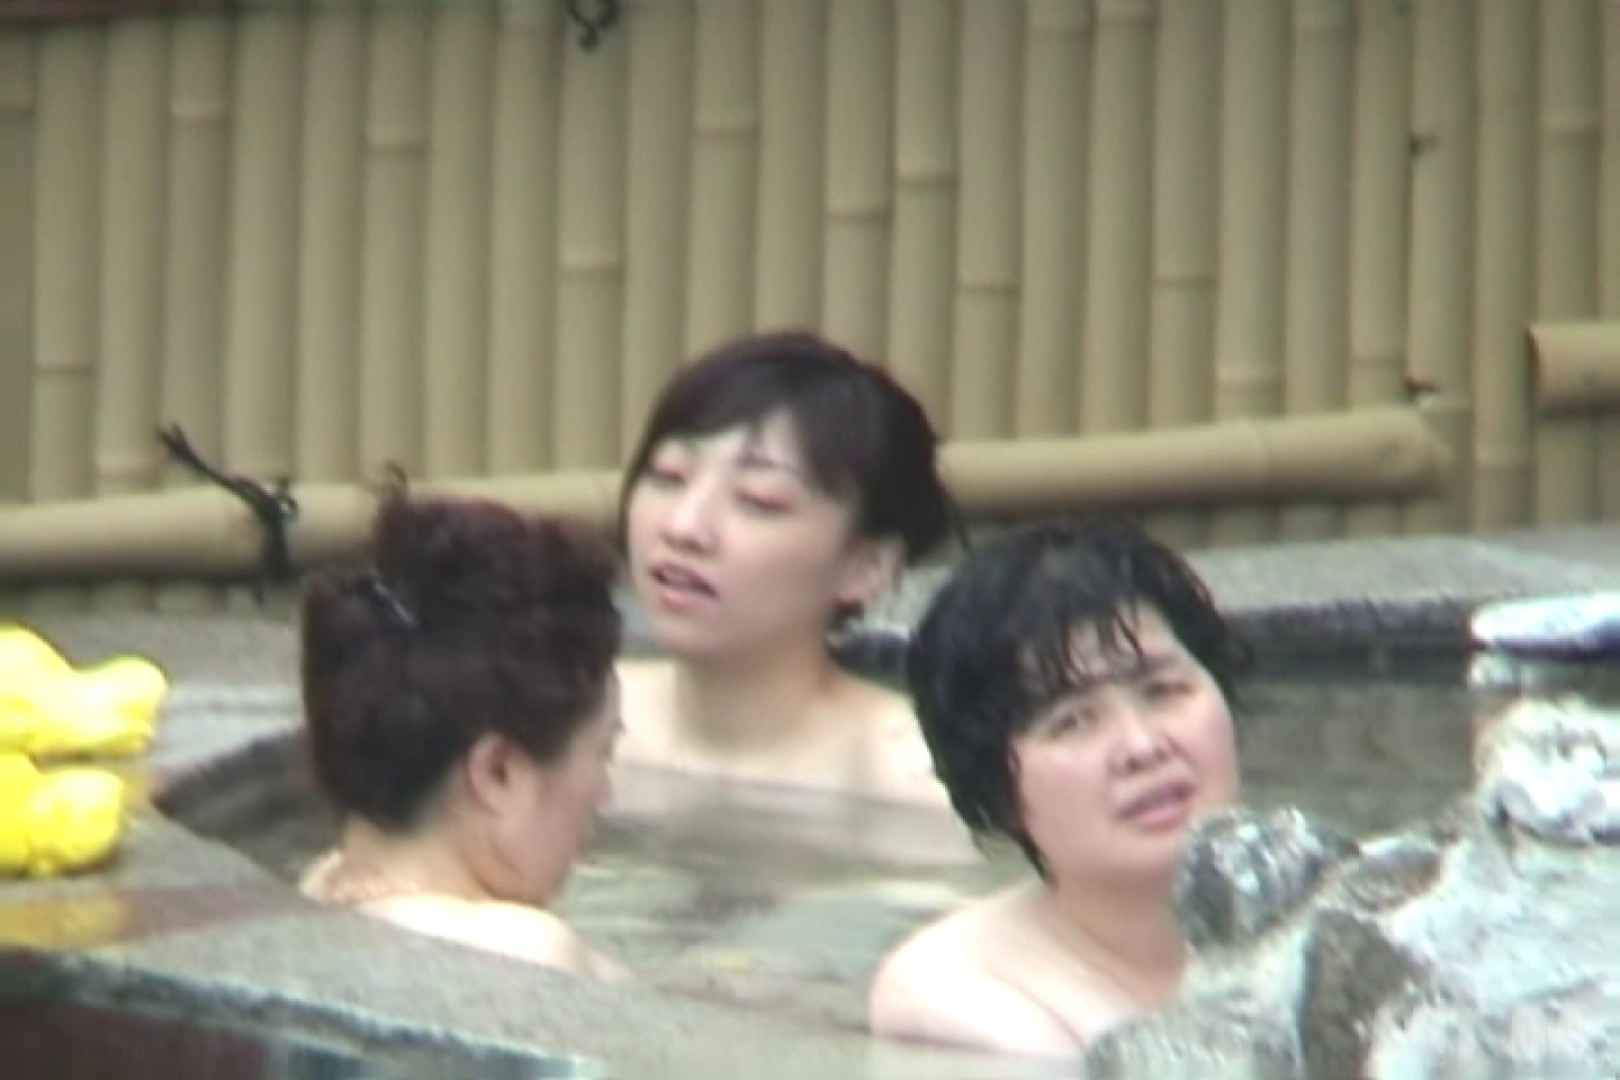 Aquaな露天風呂Vol.743 盗撮映像  75Pix 21